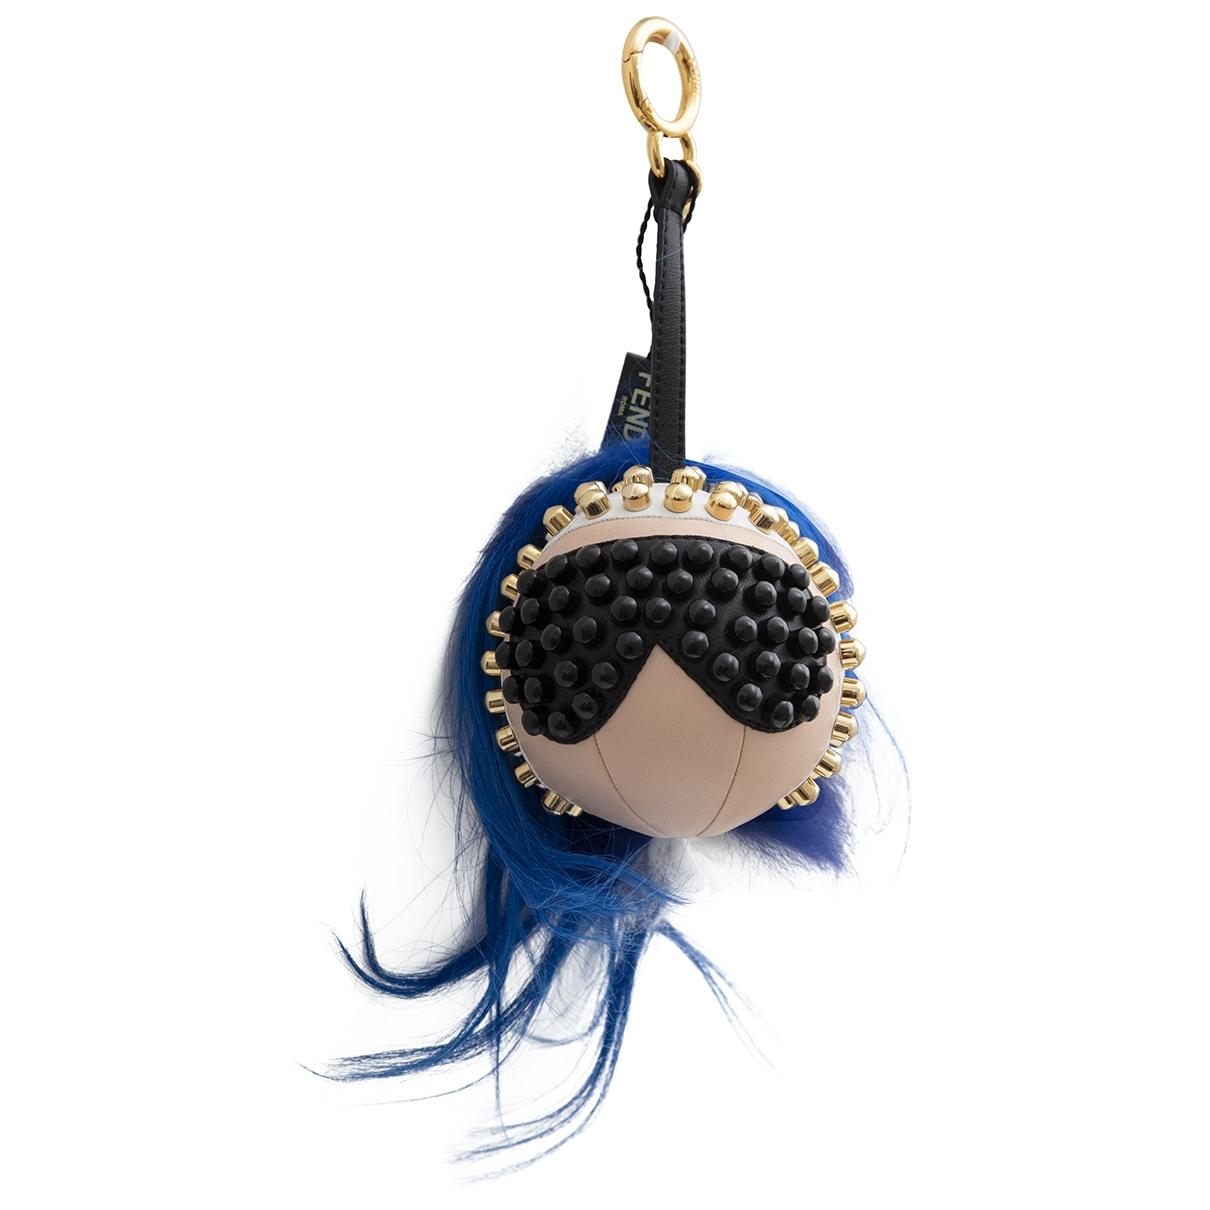 Fendi - Bijoux de sac Bag Bug pour femme en renard - bleu